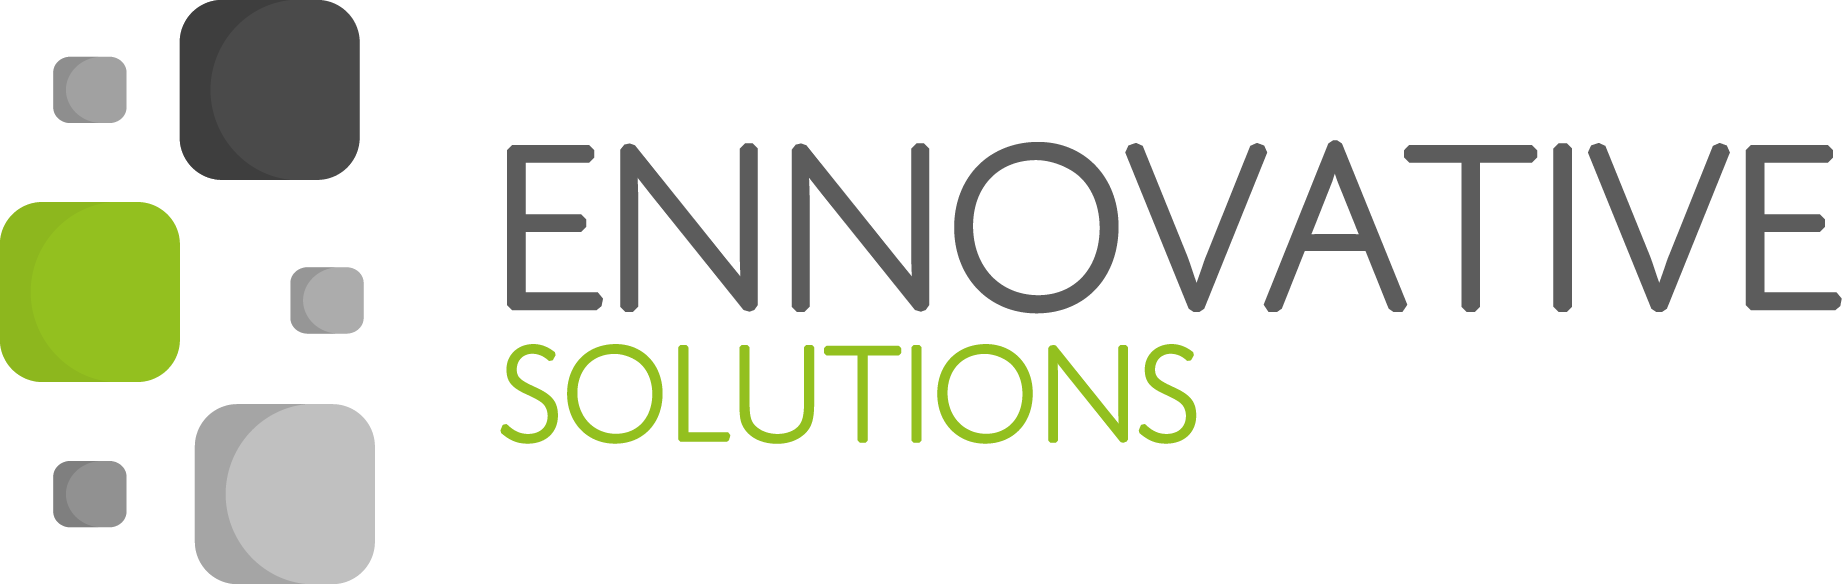 Ennovative Solutions